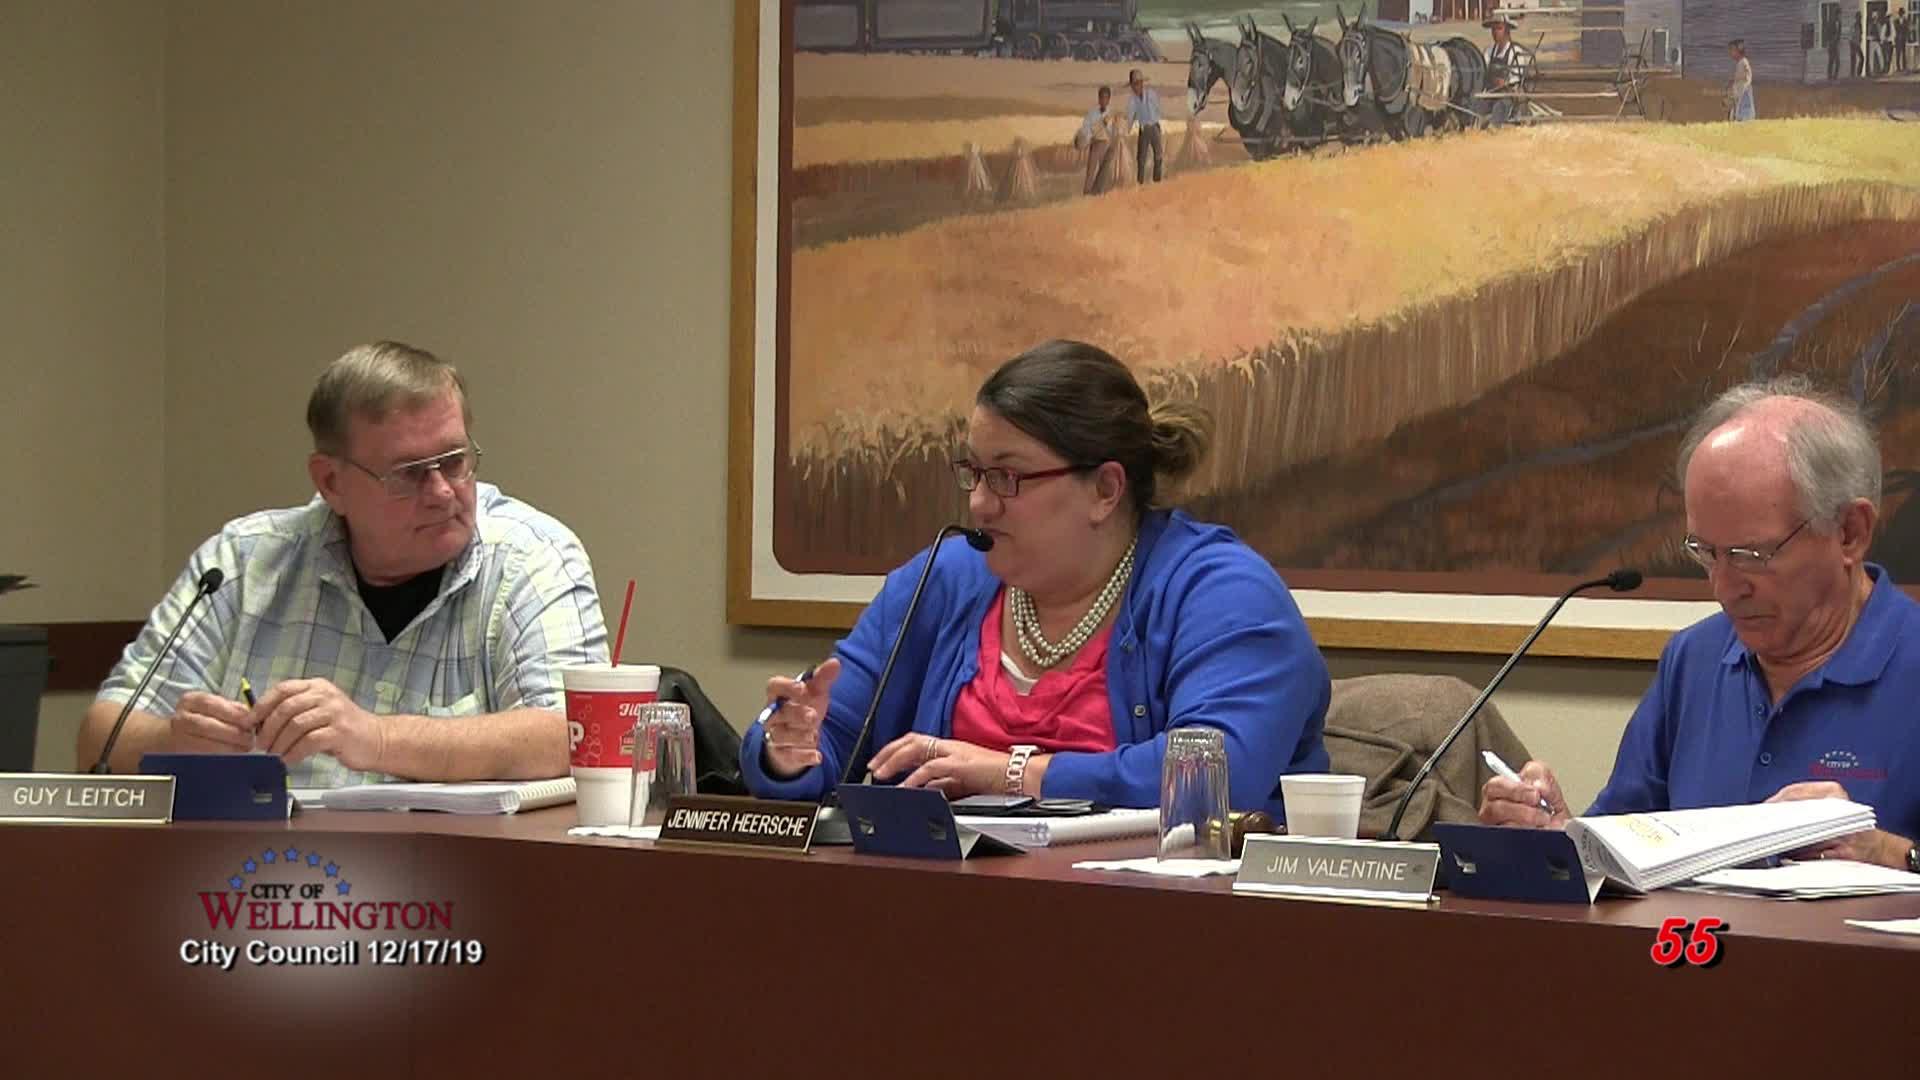 City Council Meeting 12/17/19